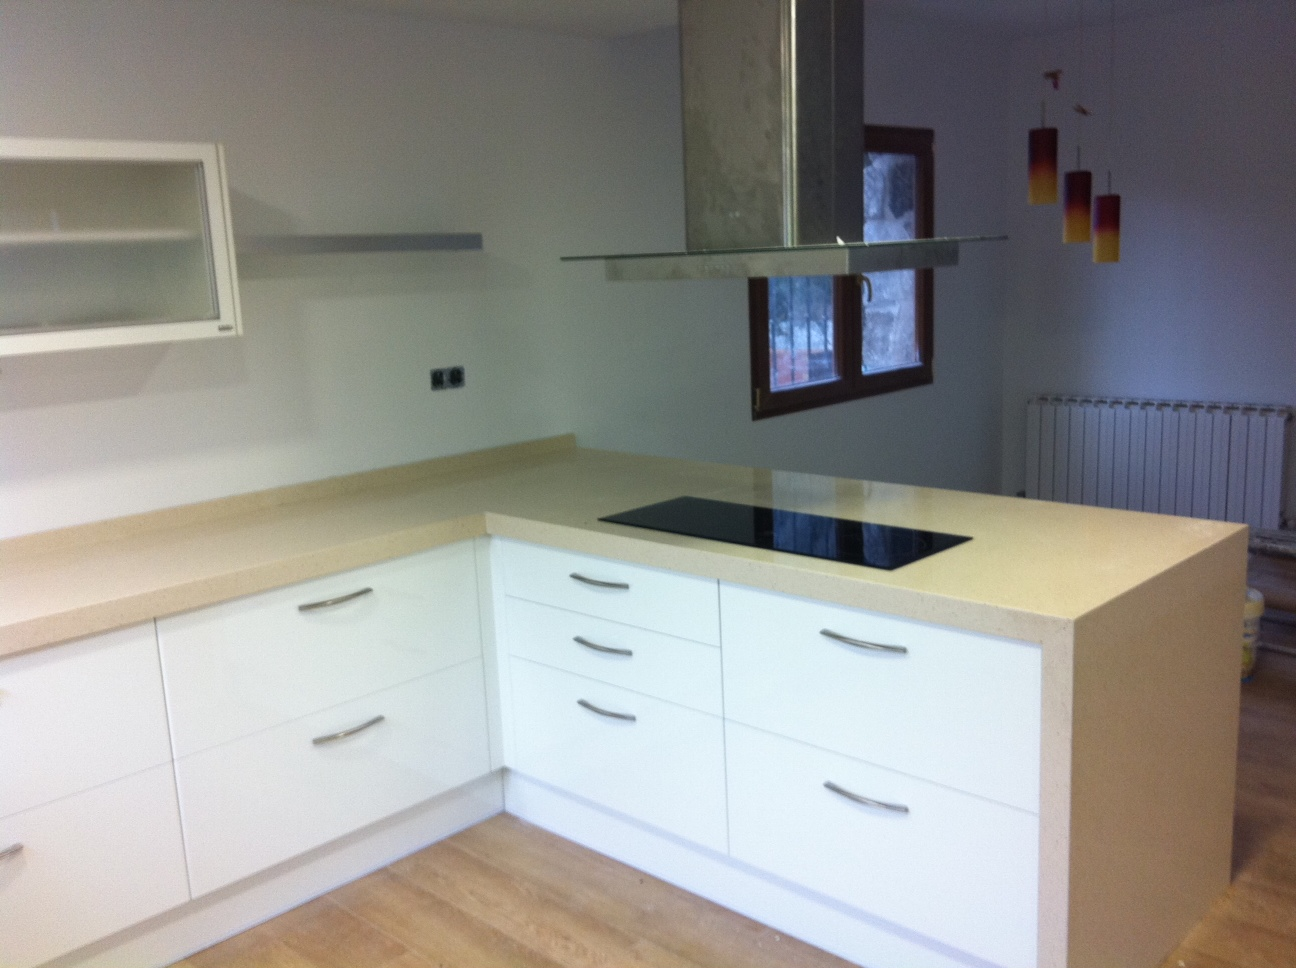 Muebles valdecocina muebles de cocina - Muebles de cocina vegasa ...